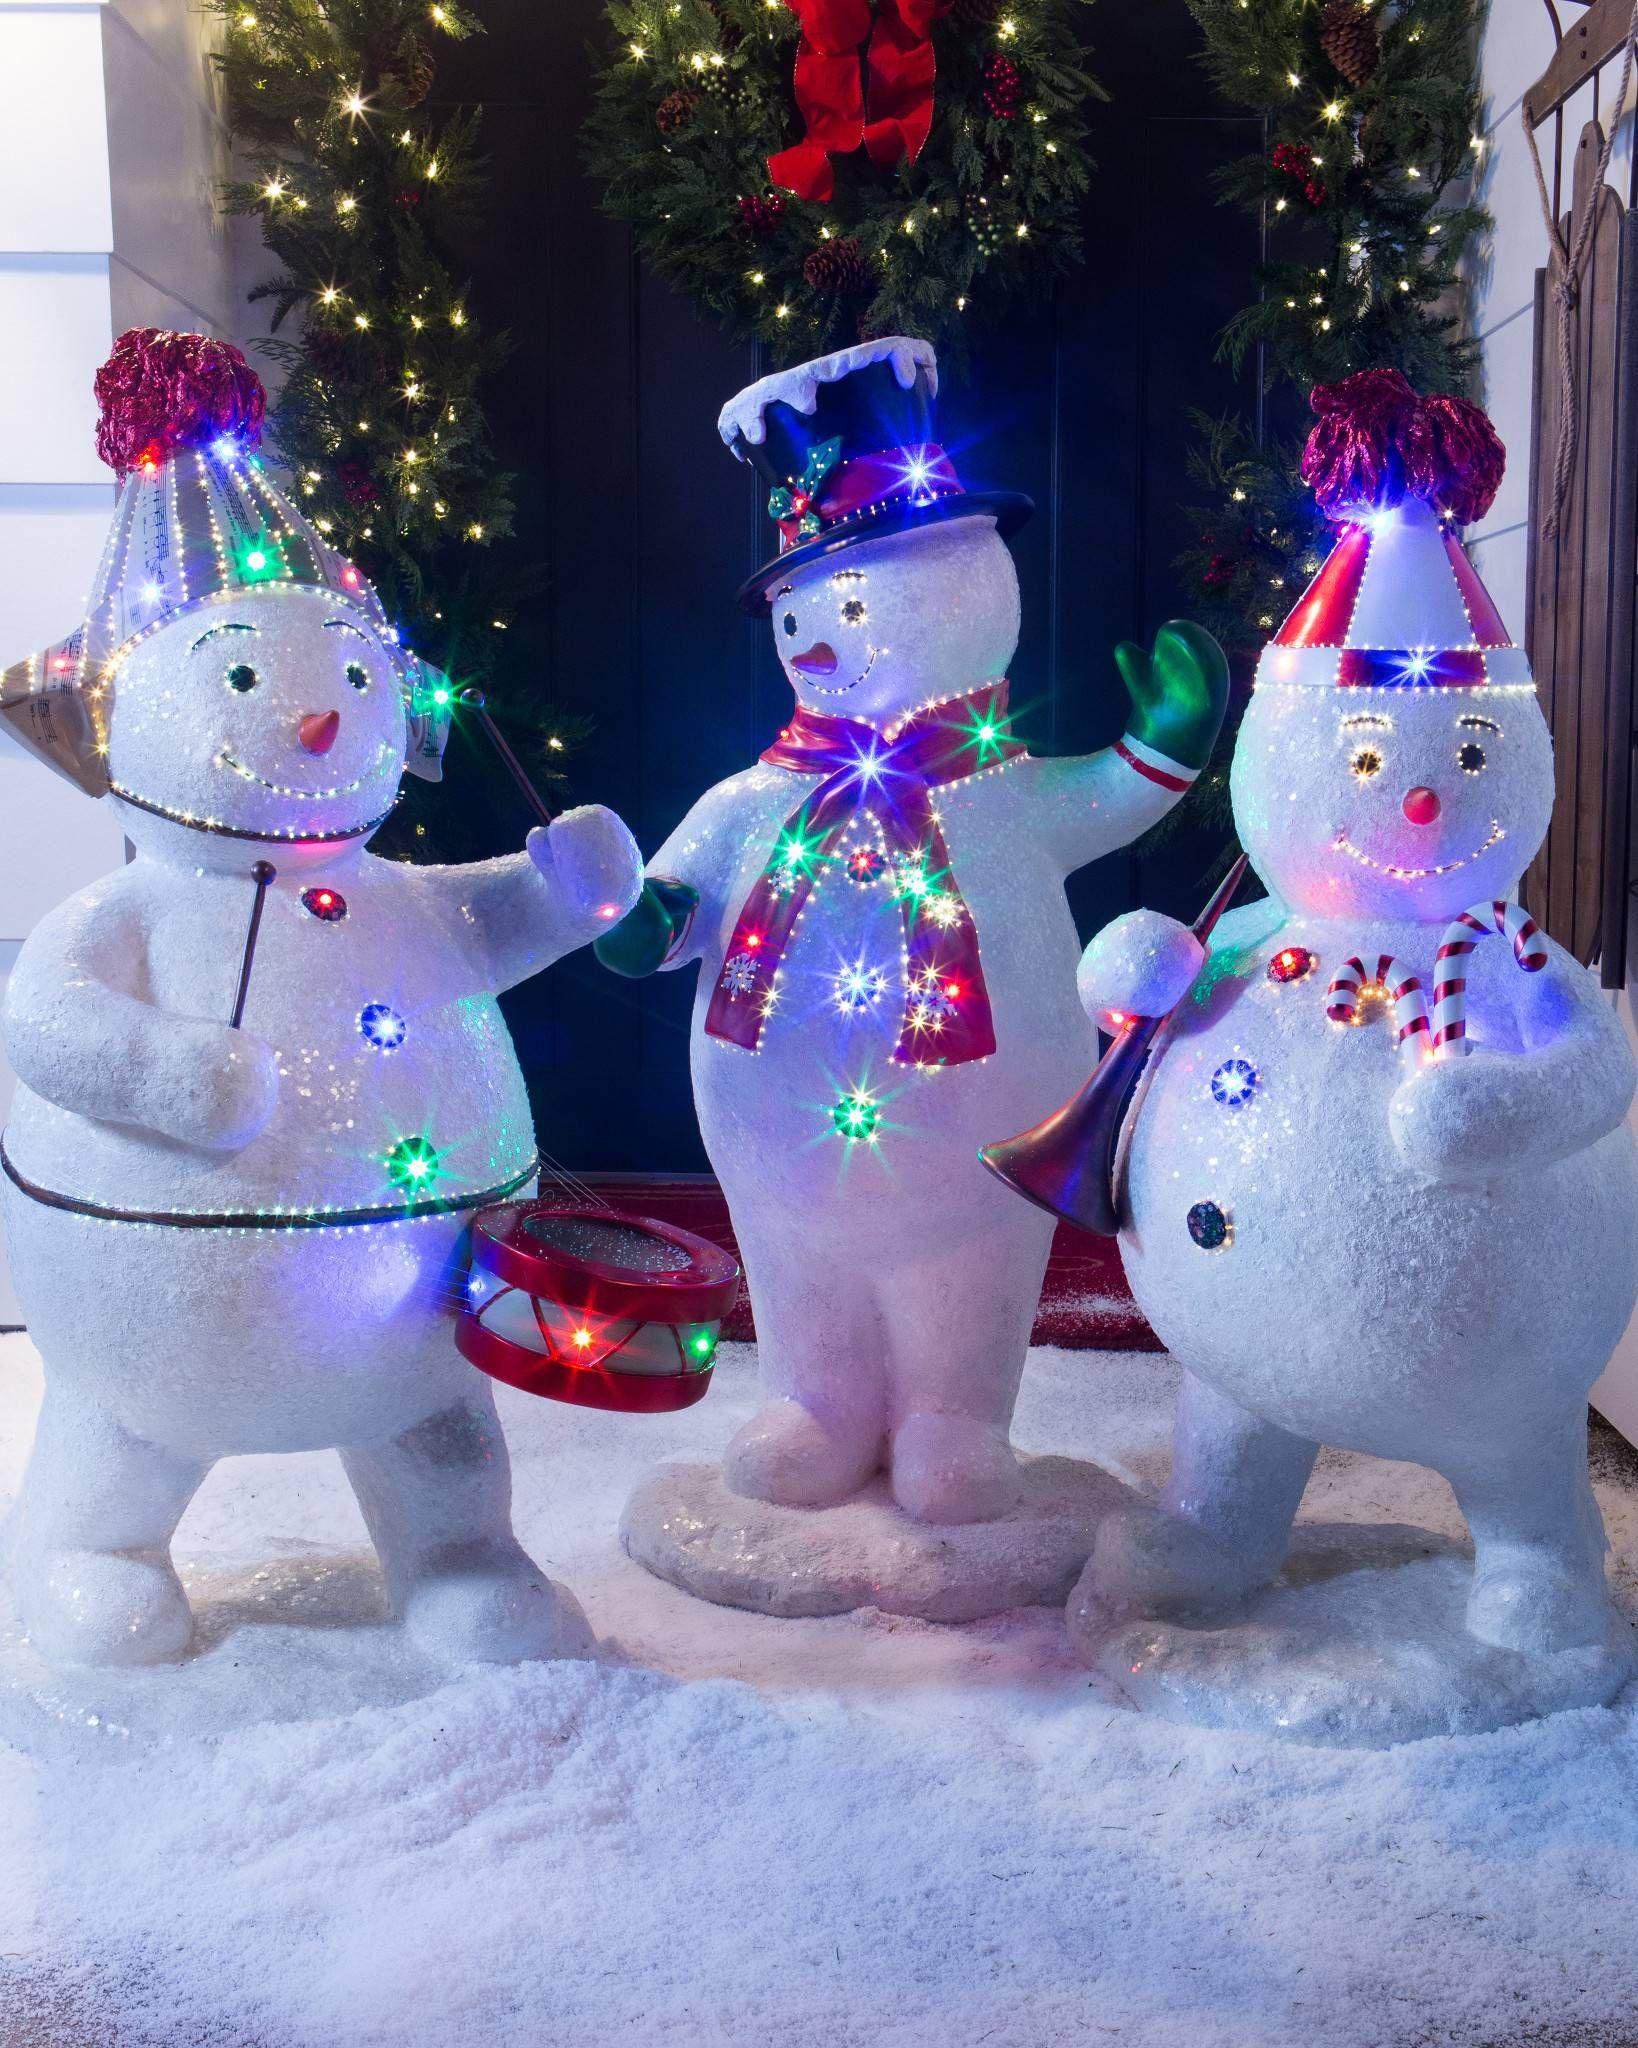 Outdoor Snowman Christmas Decorations.Outdoor Fiber Optic Snowman Band Outdoor Decorating Ideas